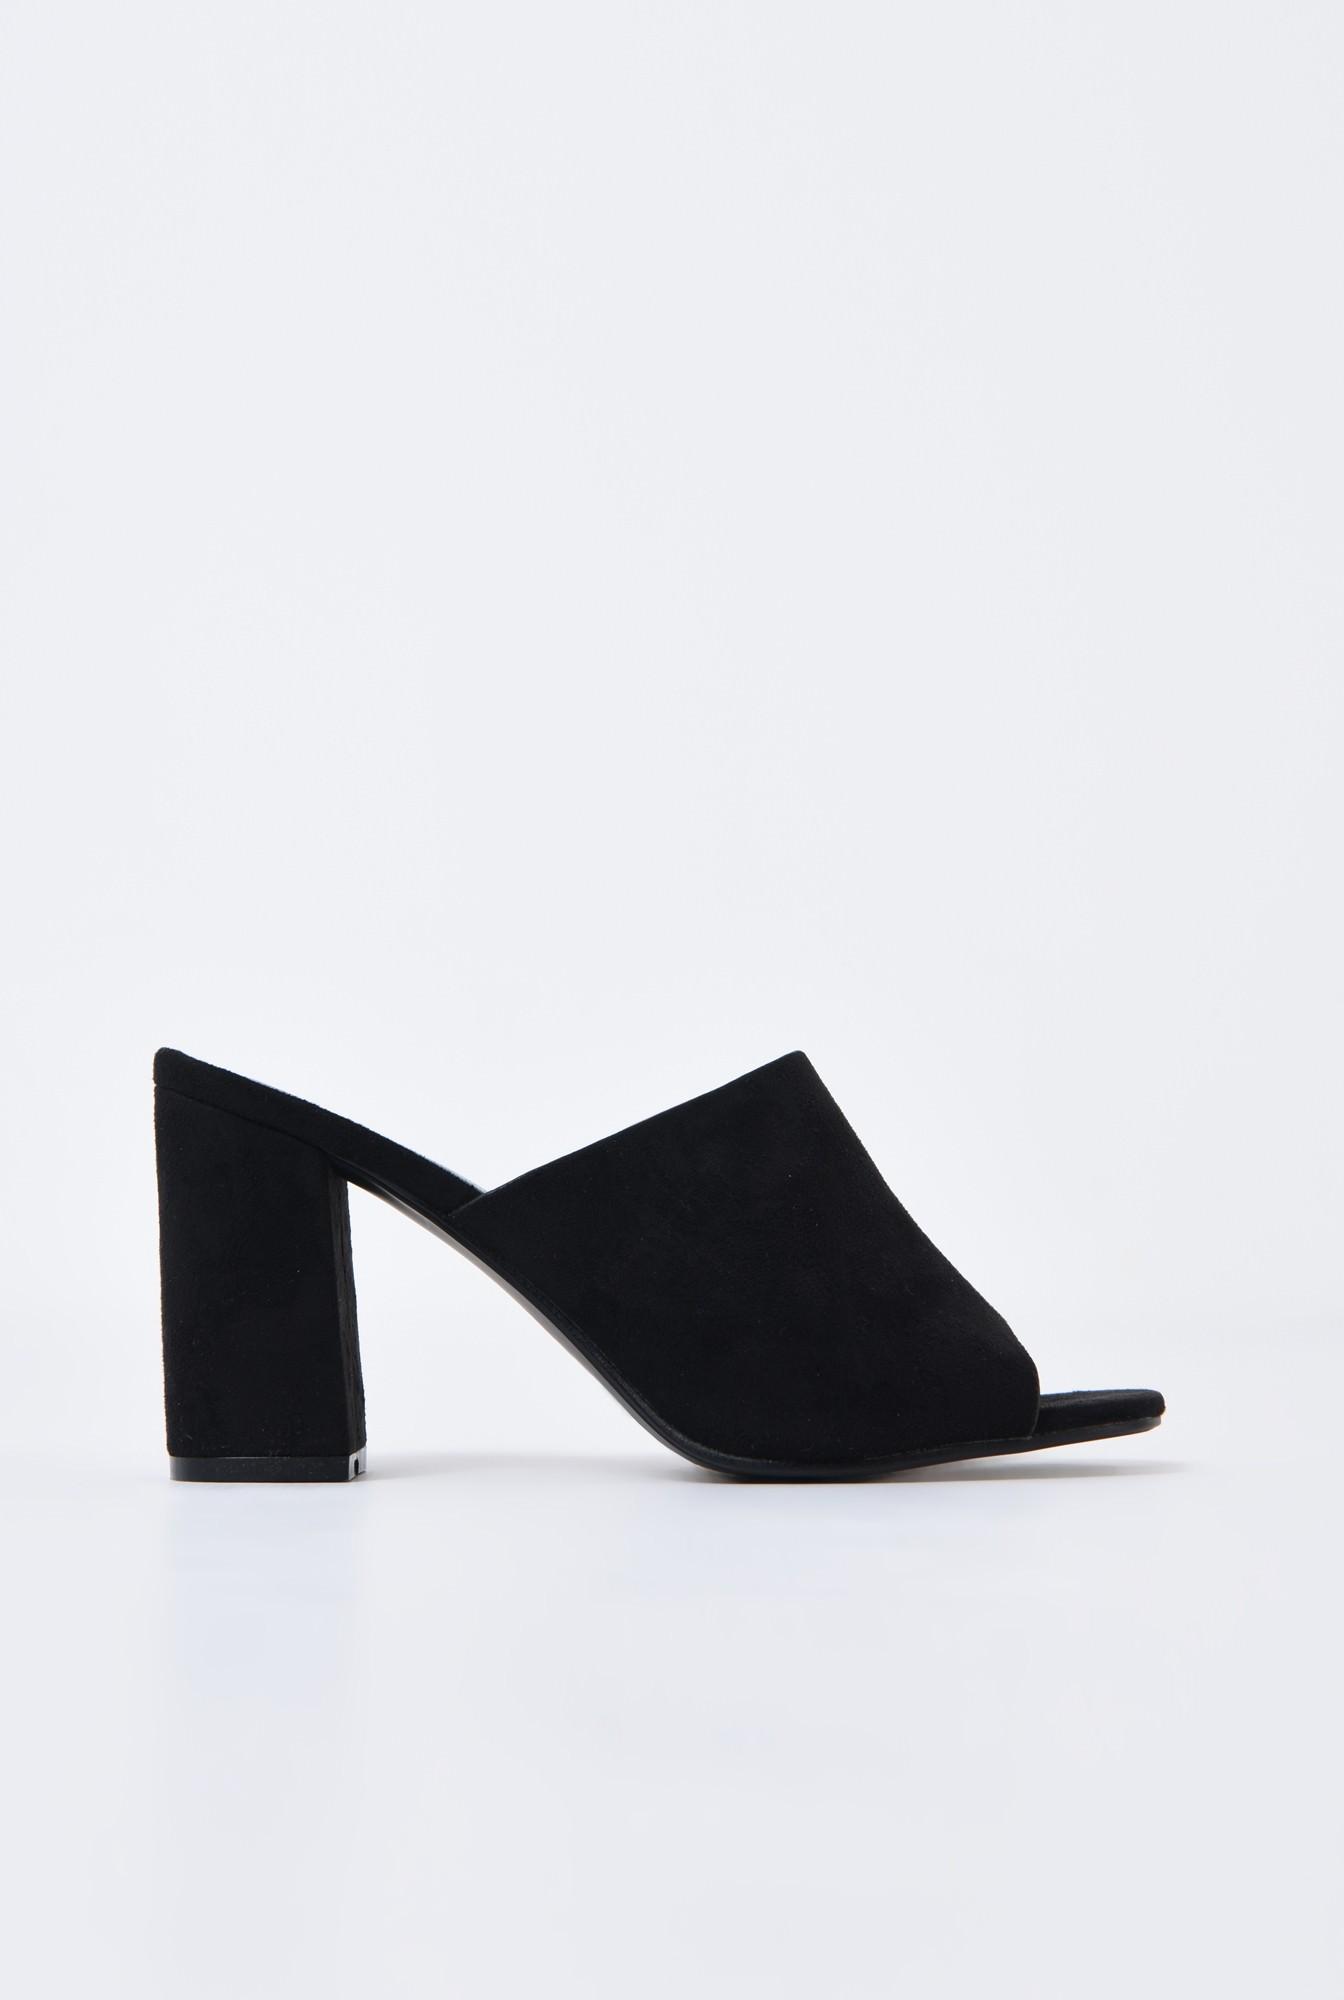 0 - saboti, negru, toc gros, varf decupat, sandale online